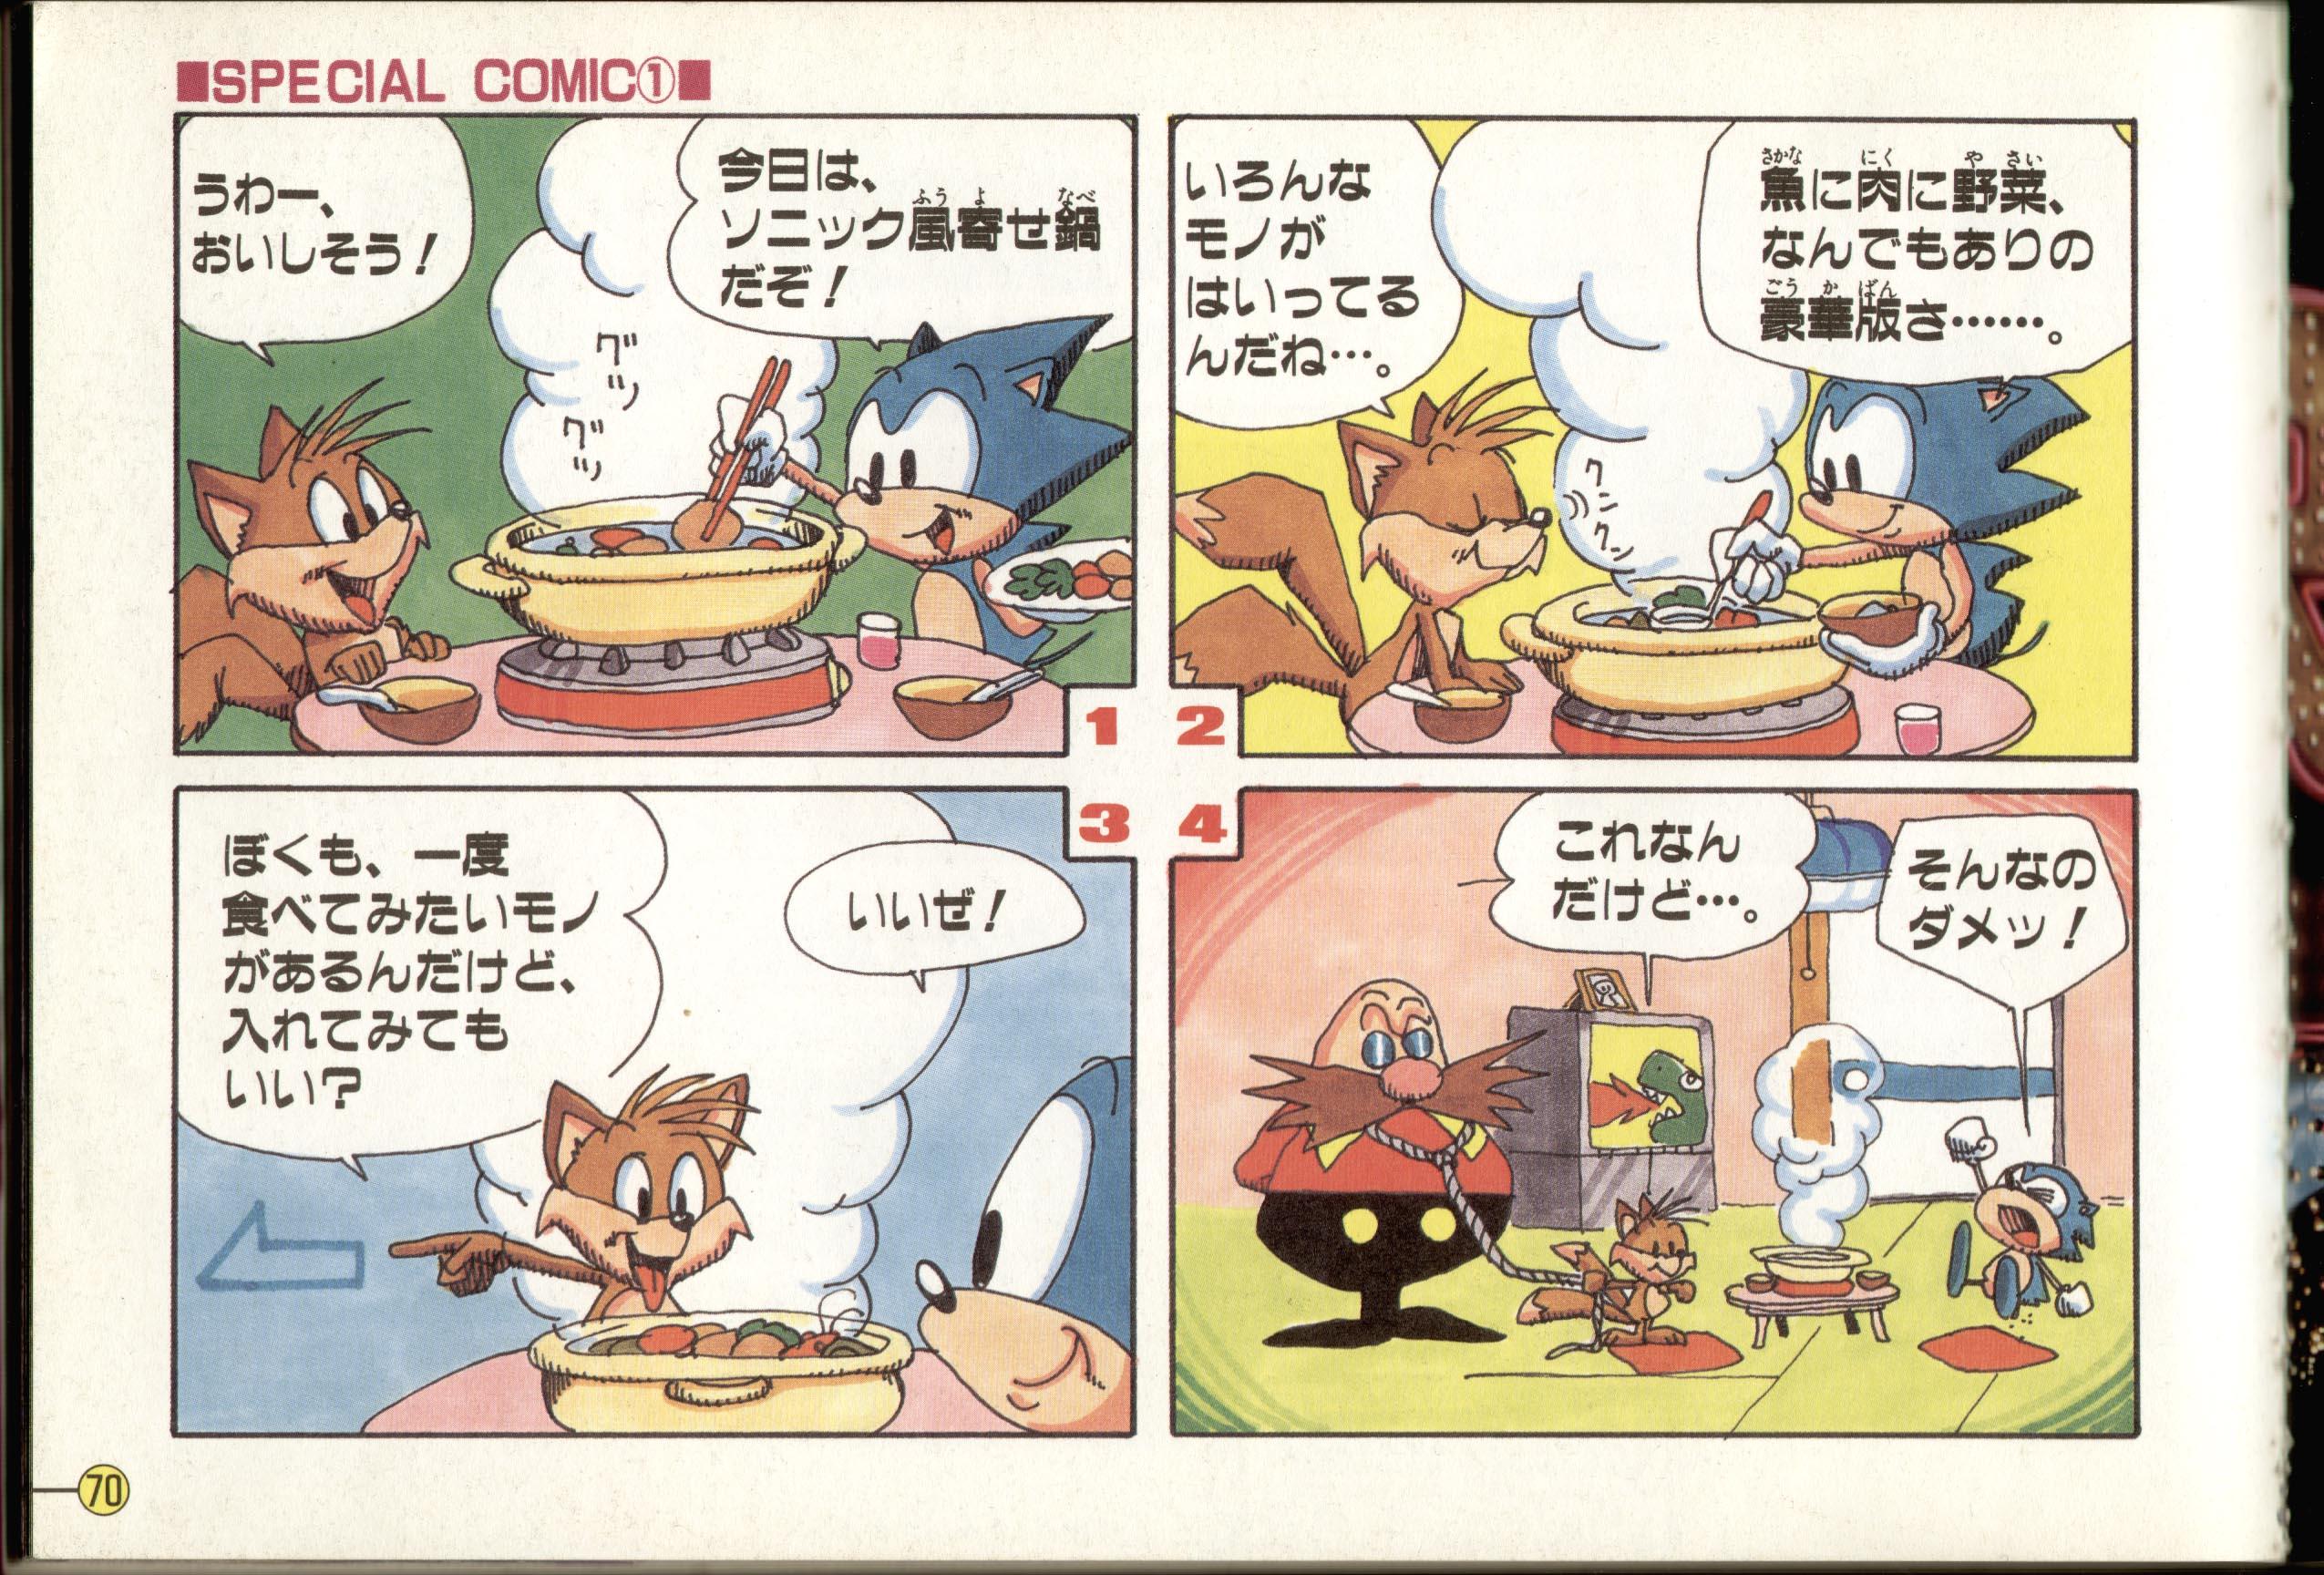 Sonic 2 Manual Art - Pg 06